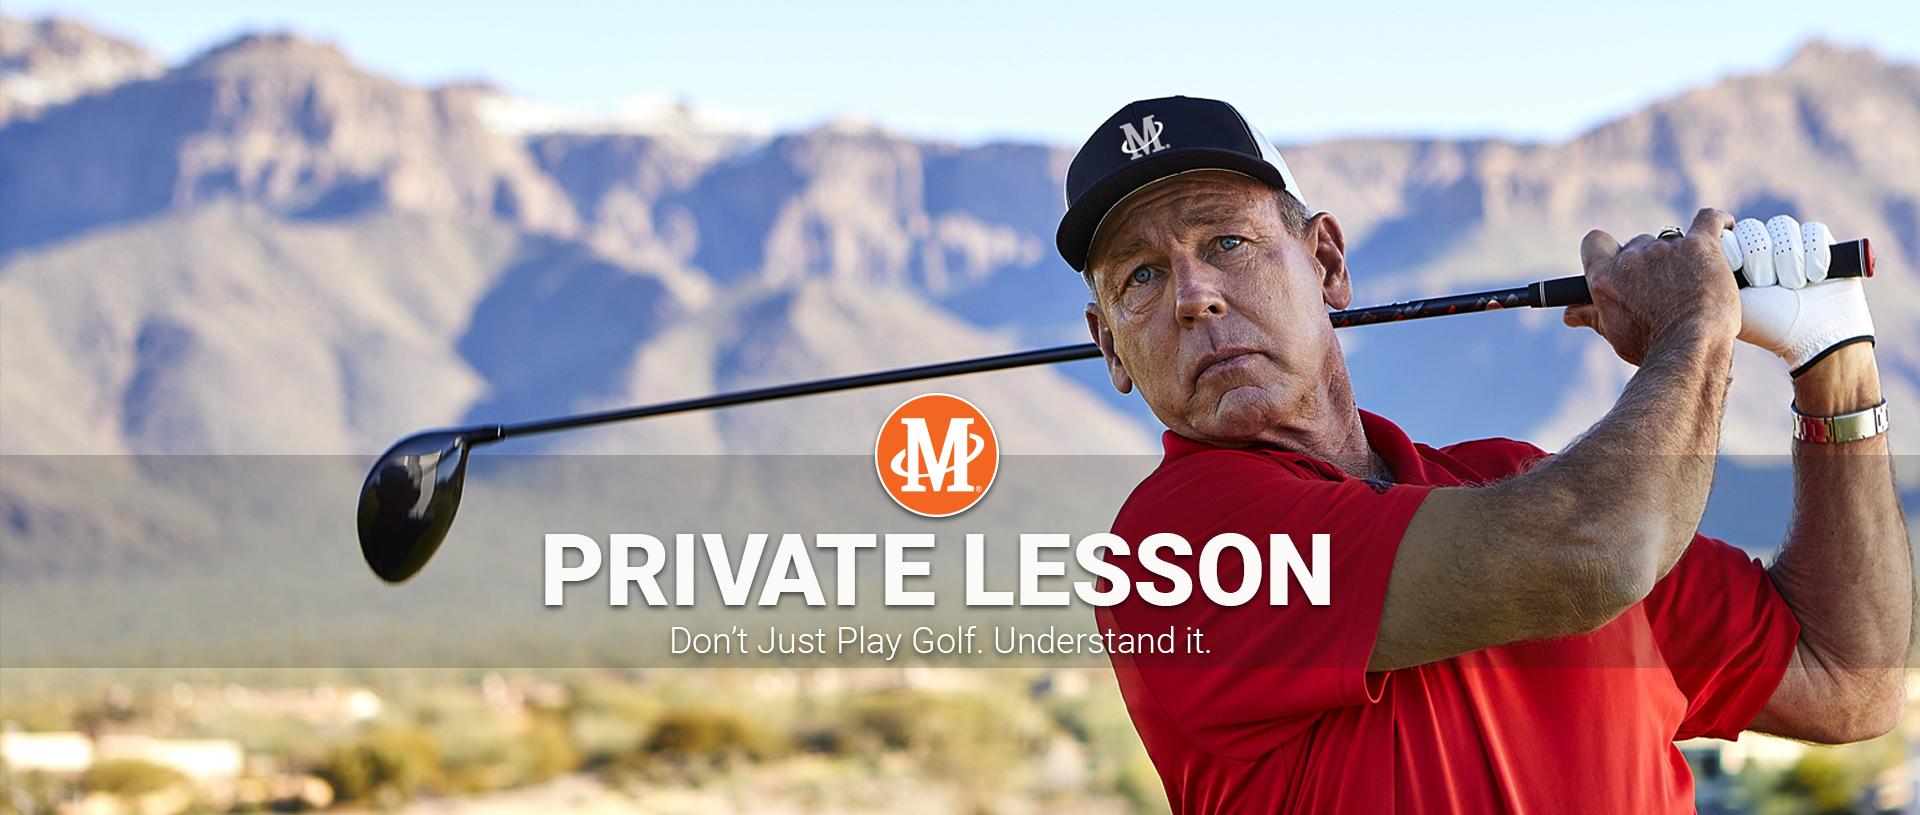 Malaska Golf, Mike Malaska, Private Lessons, Golf Lesson, Hourly Lesson